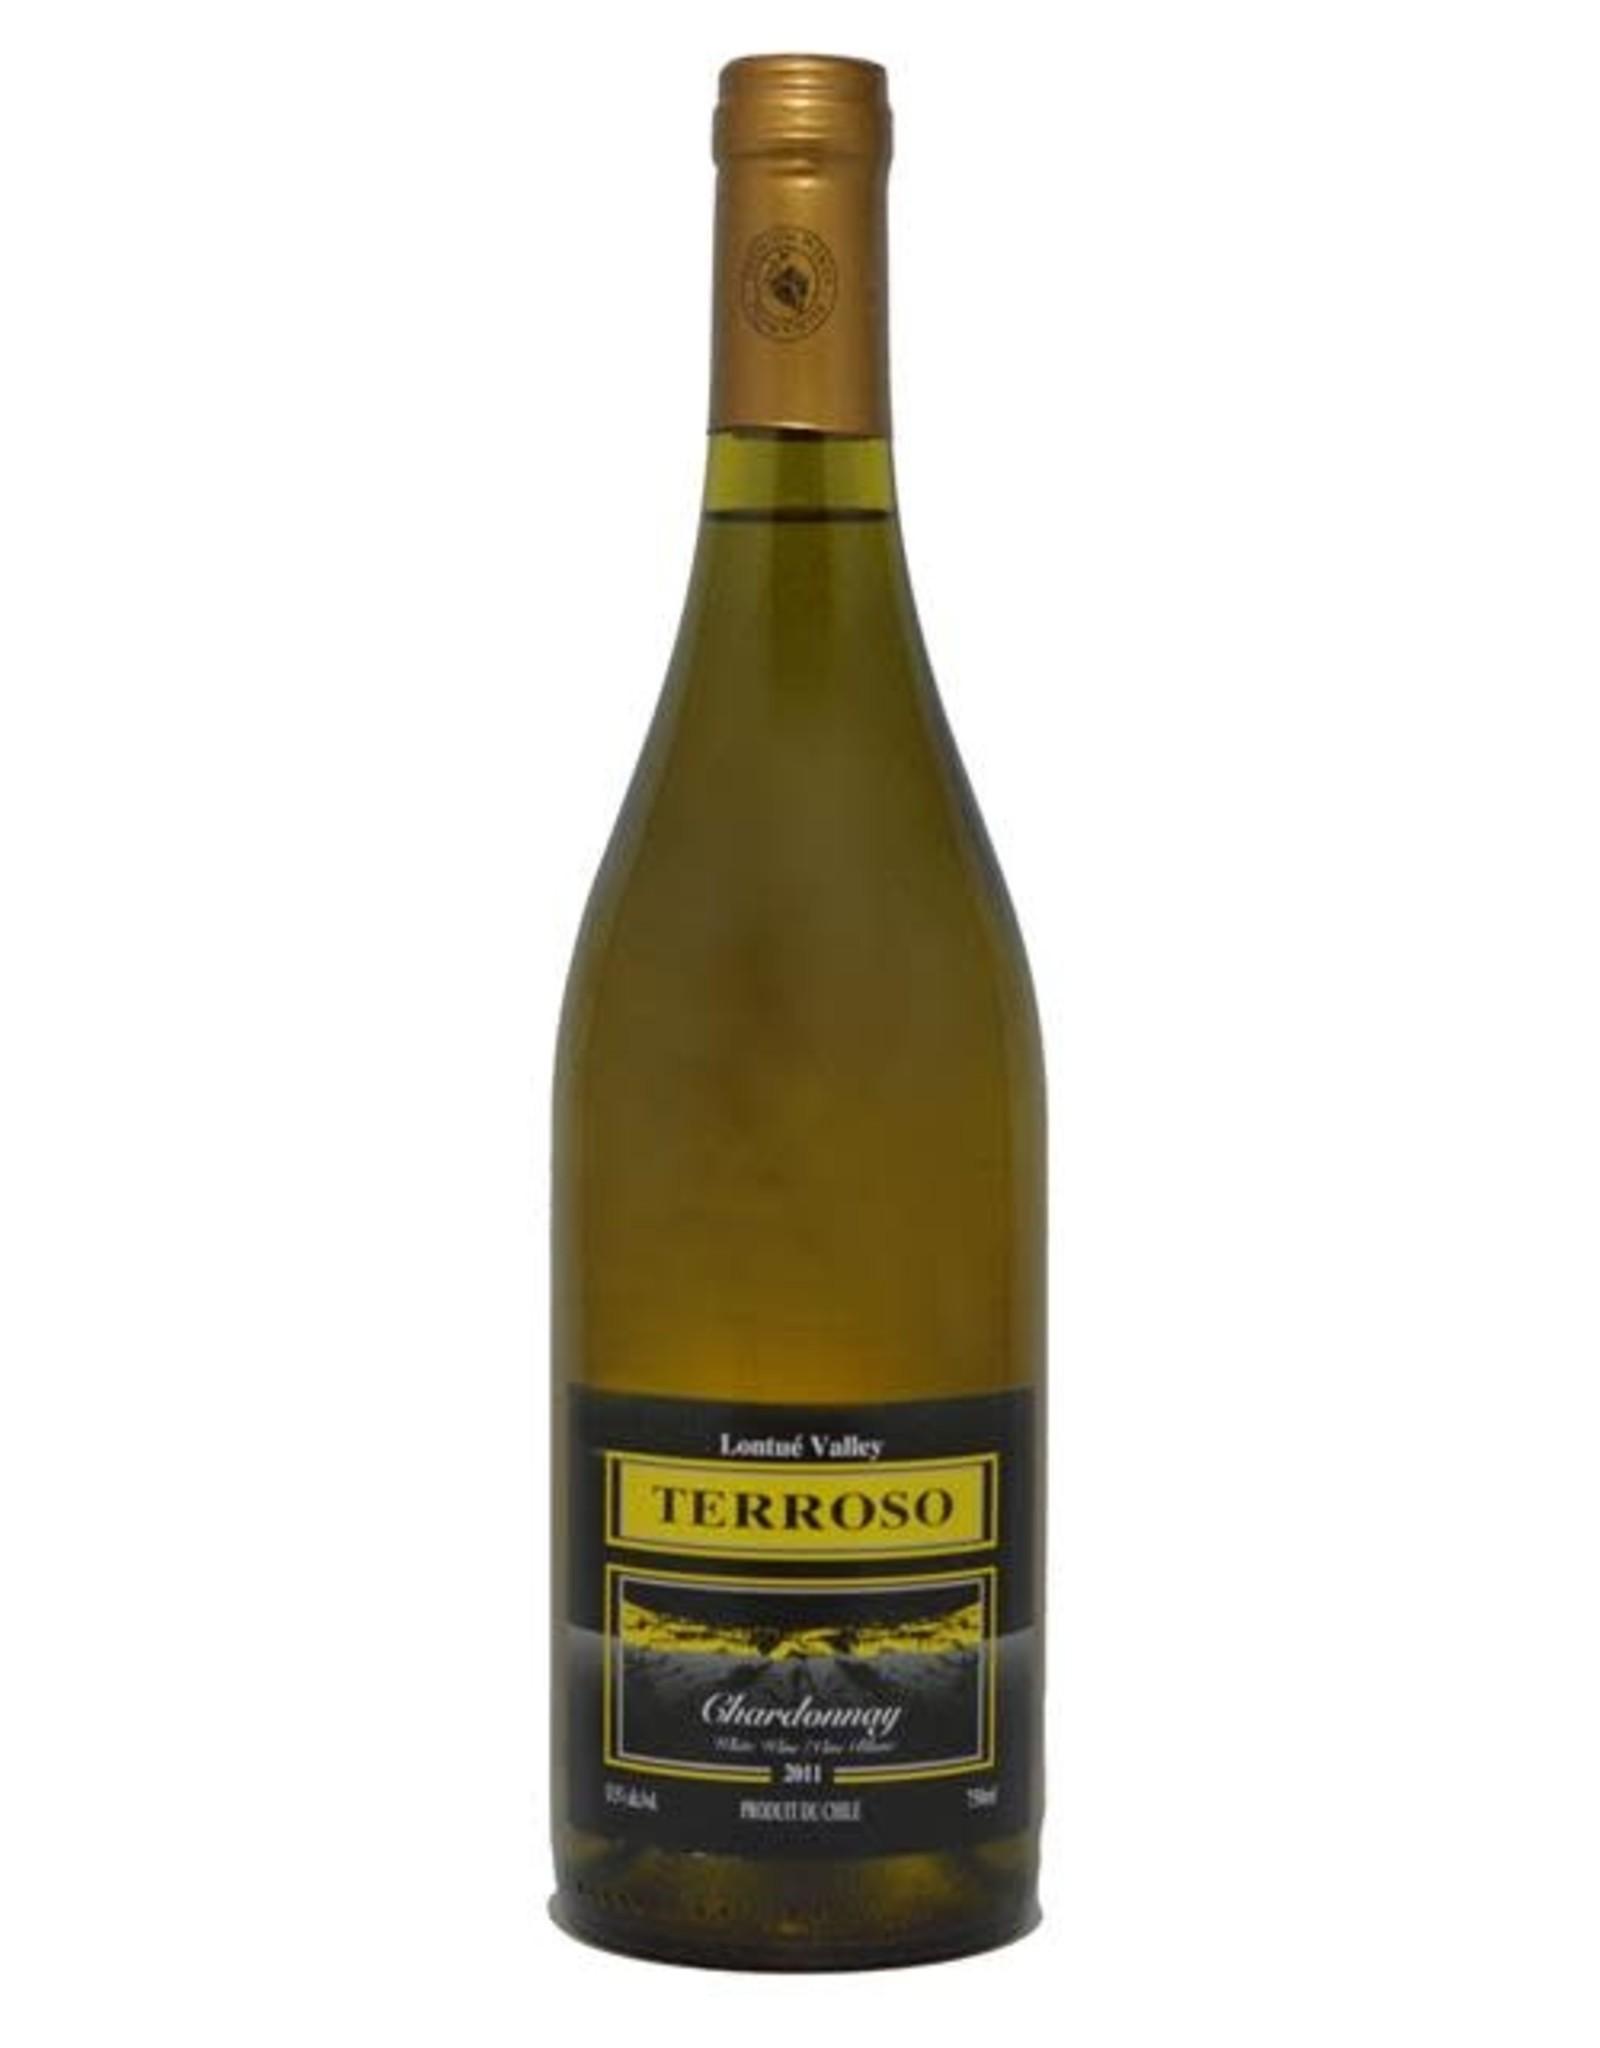 Terroso Chardonnay 2015